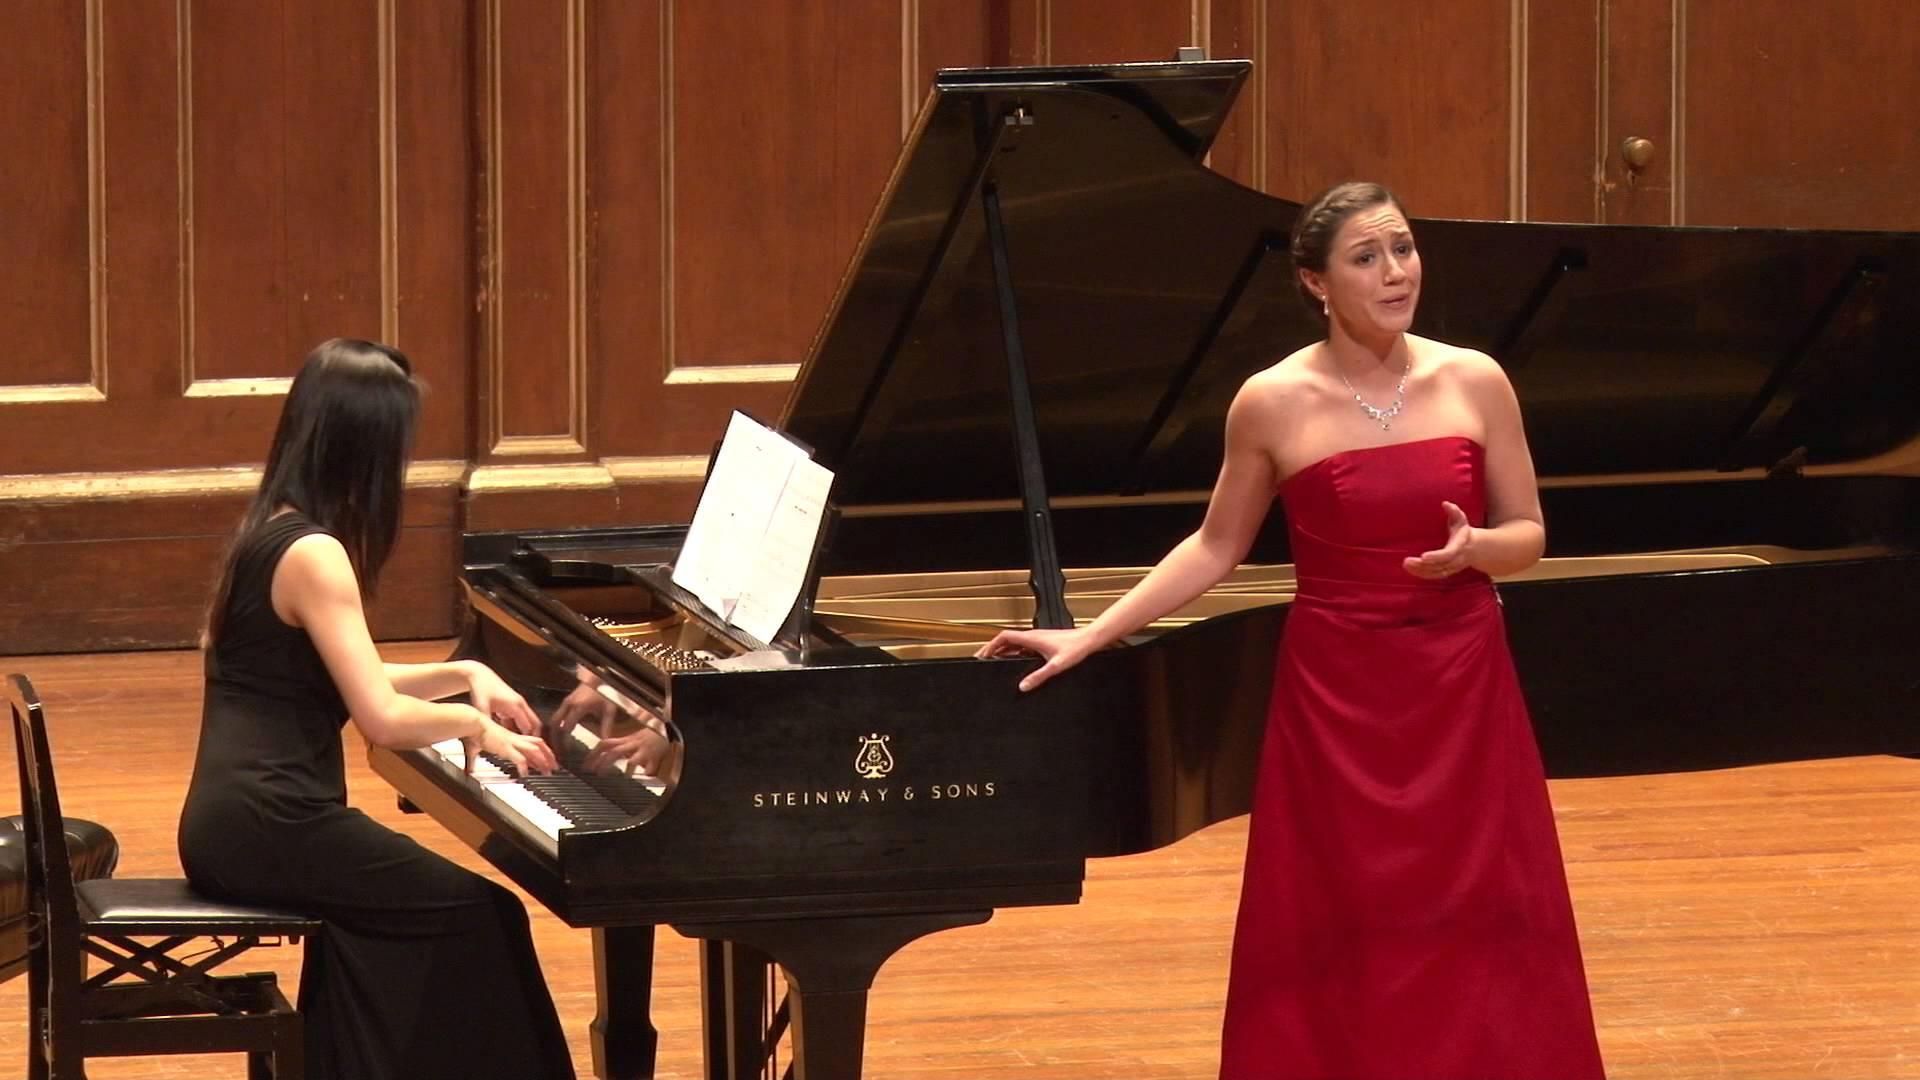 Juilliard piano faculty sexual misconduct